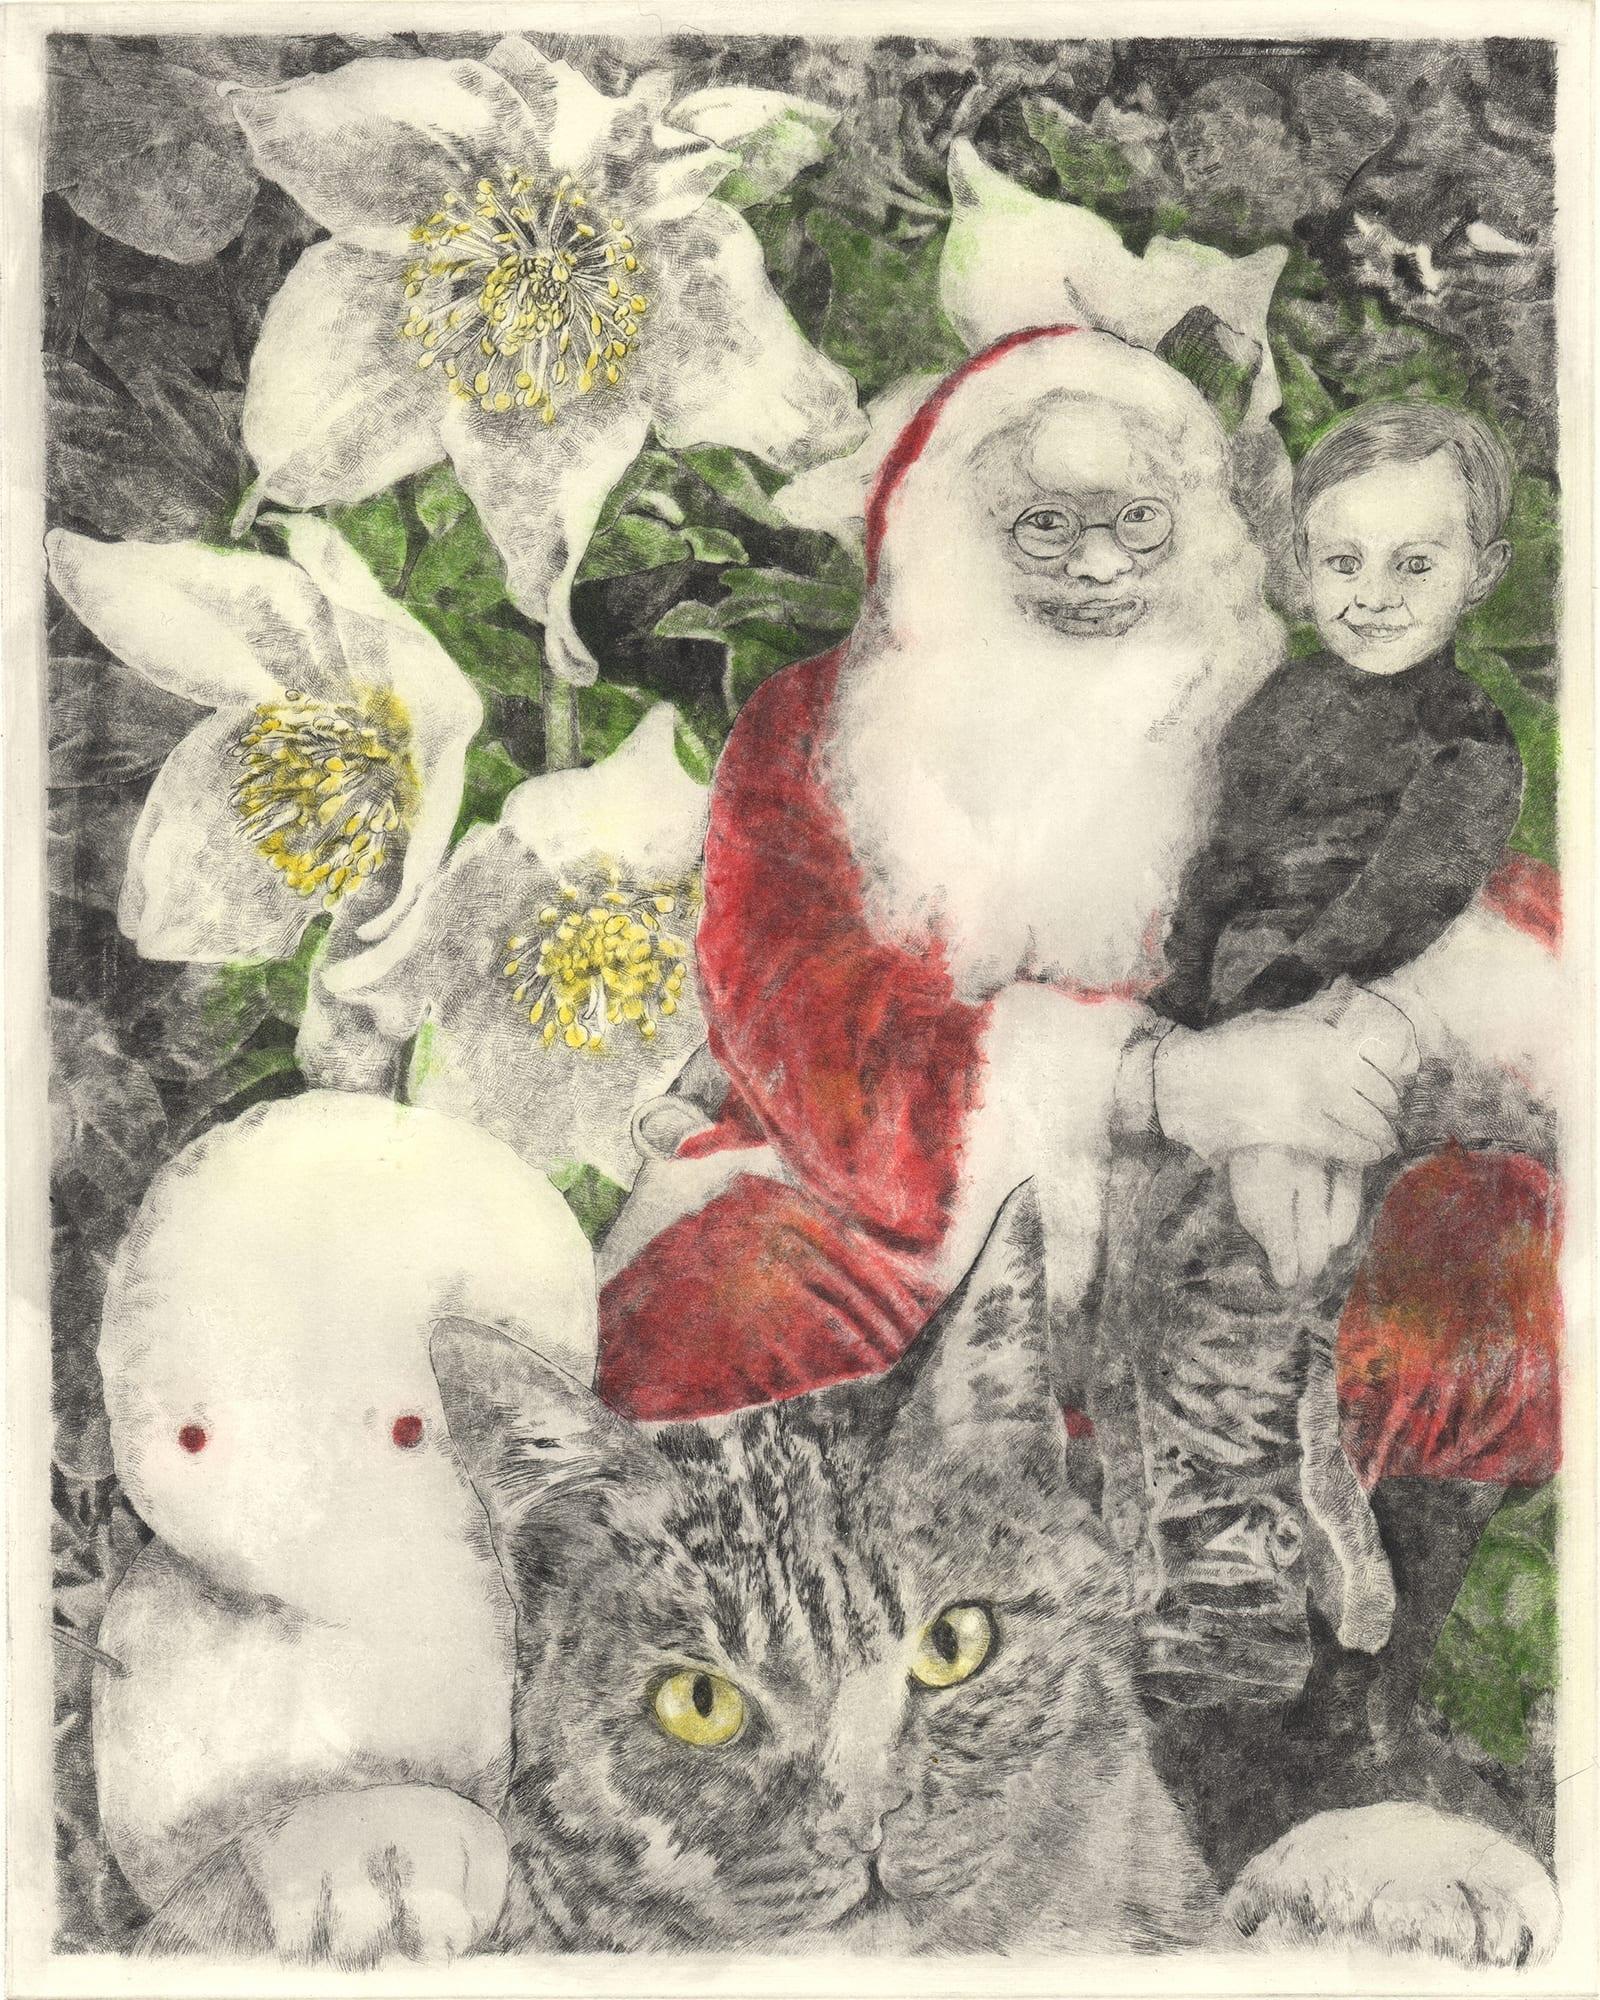 Winter 3 (drypoint etching by Yaemi Shigyo)